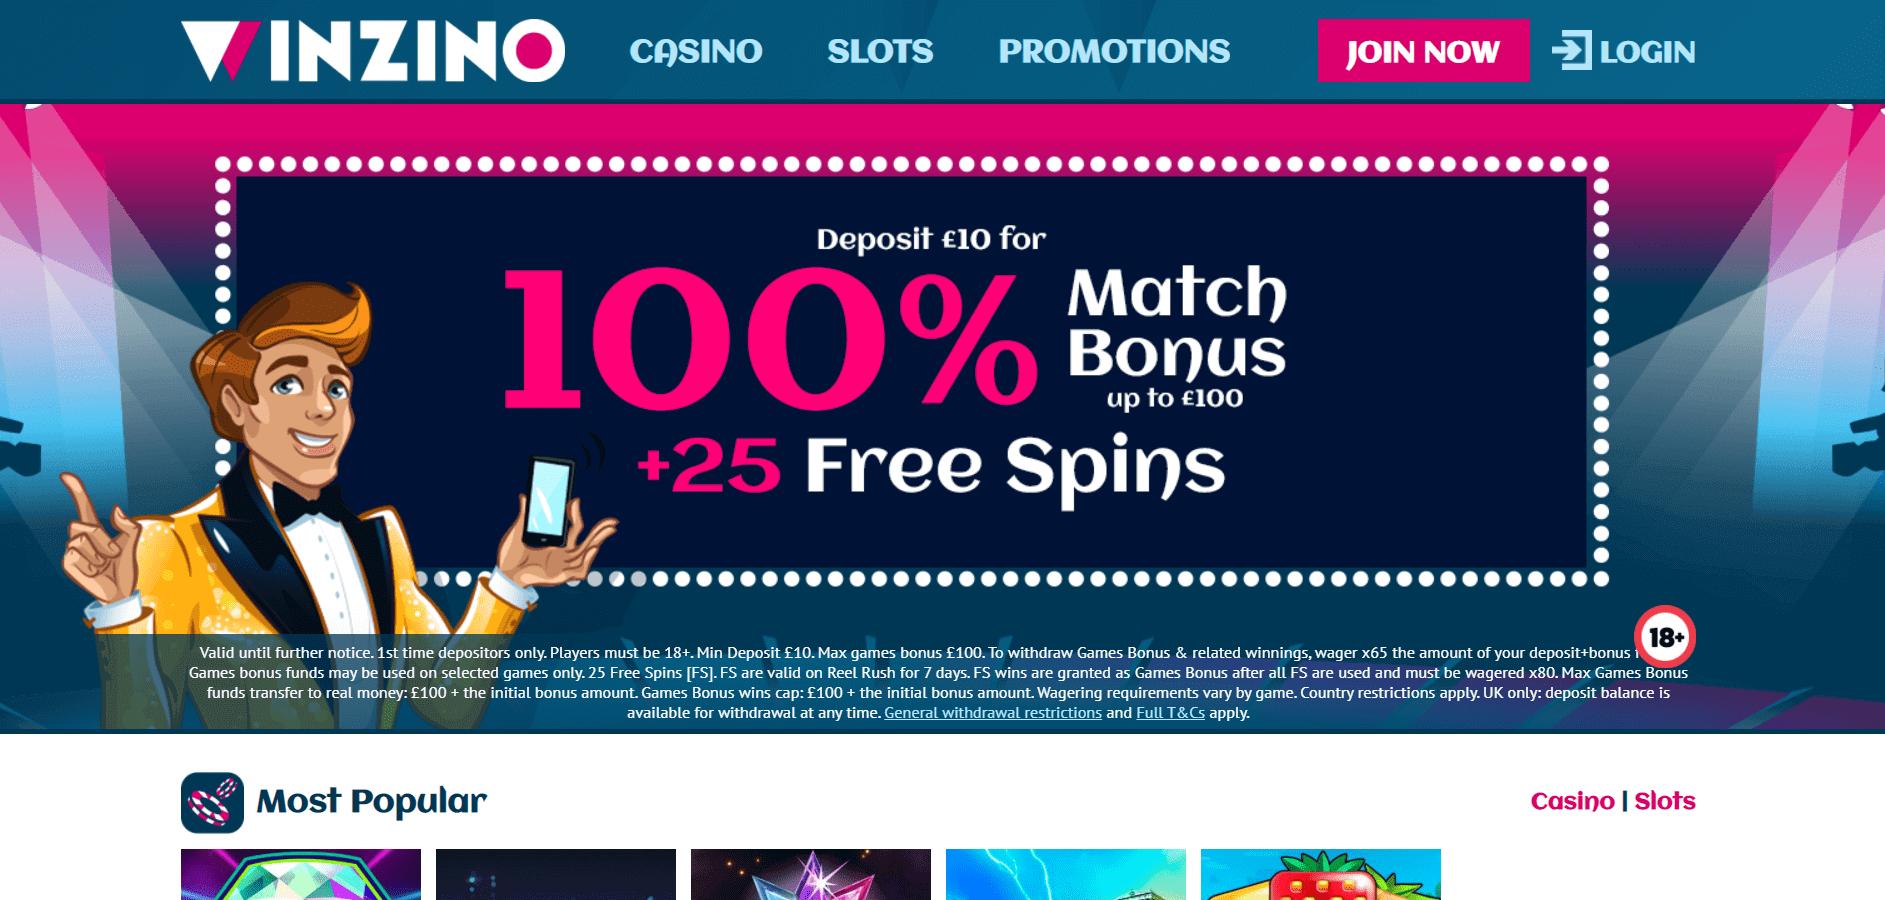 winzino casino bonuses